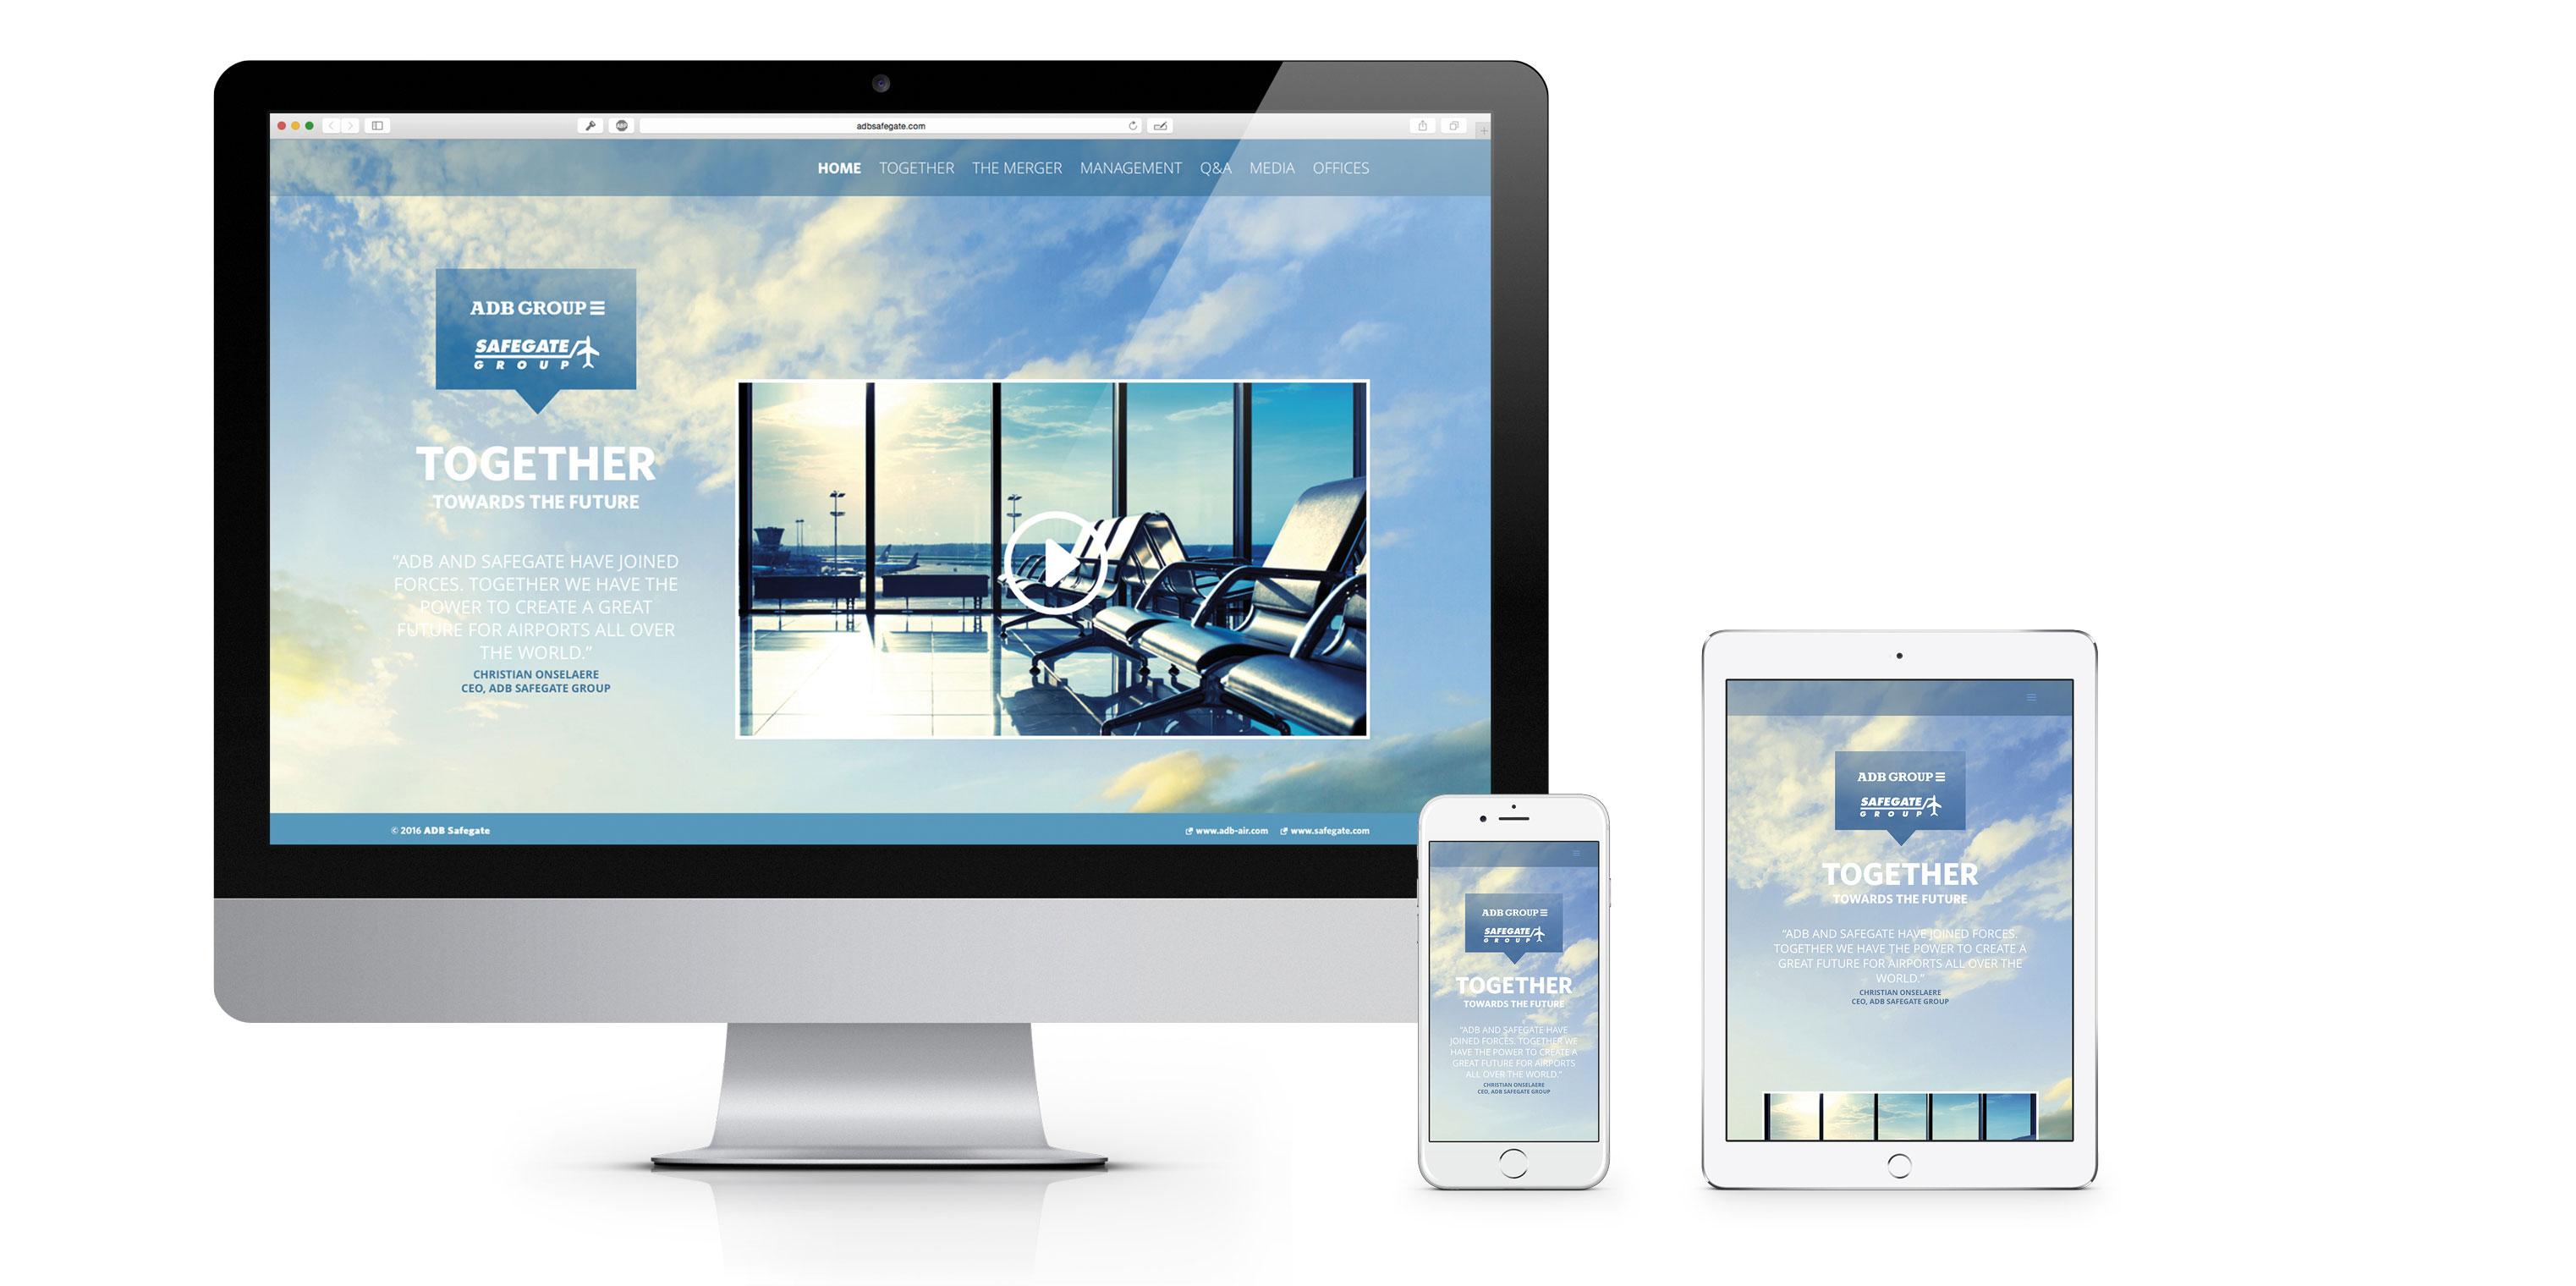 imac-iphone-ipad_3045x1520px